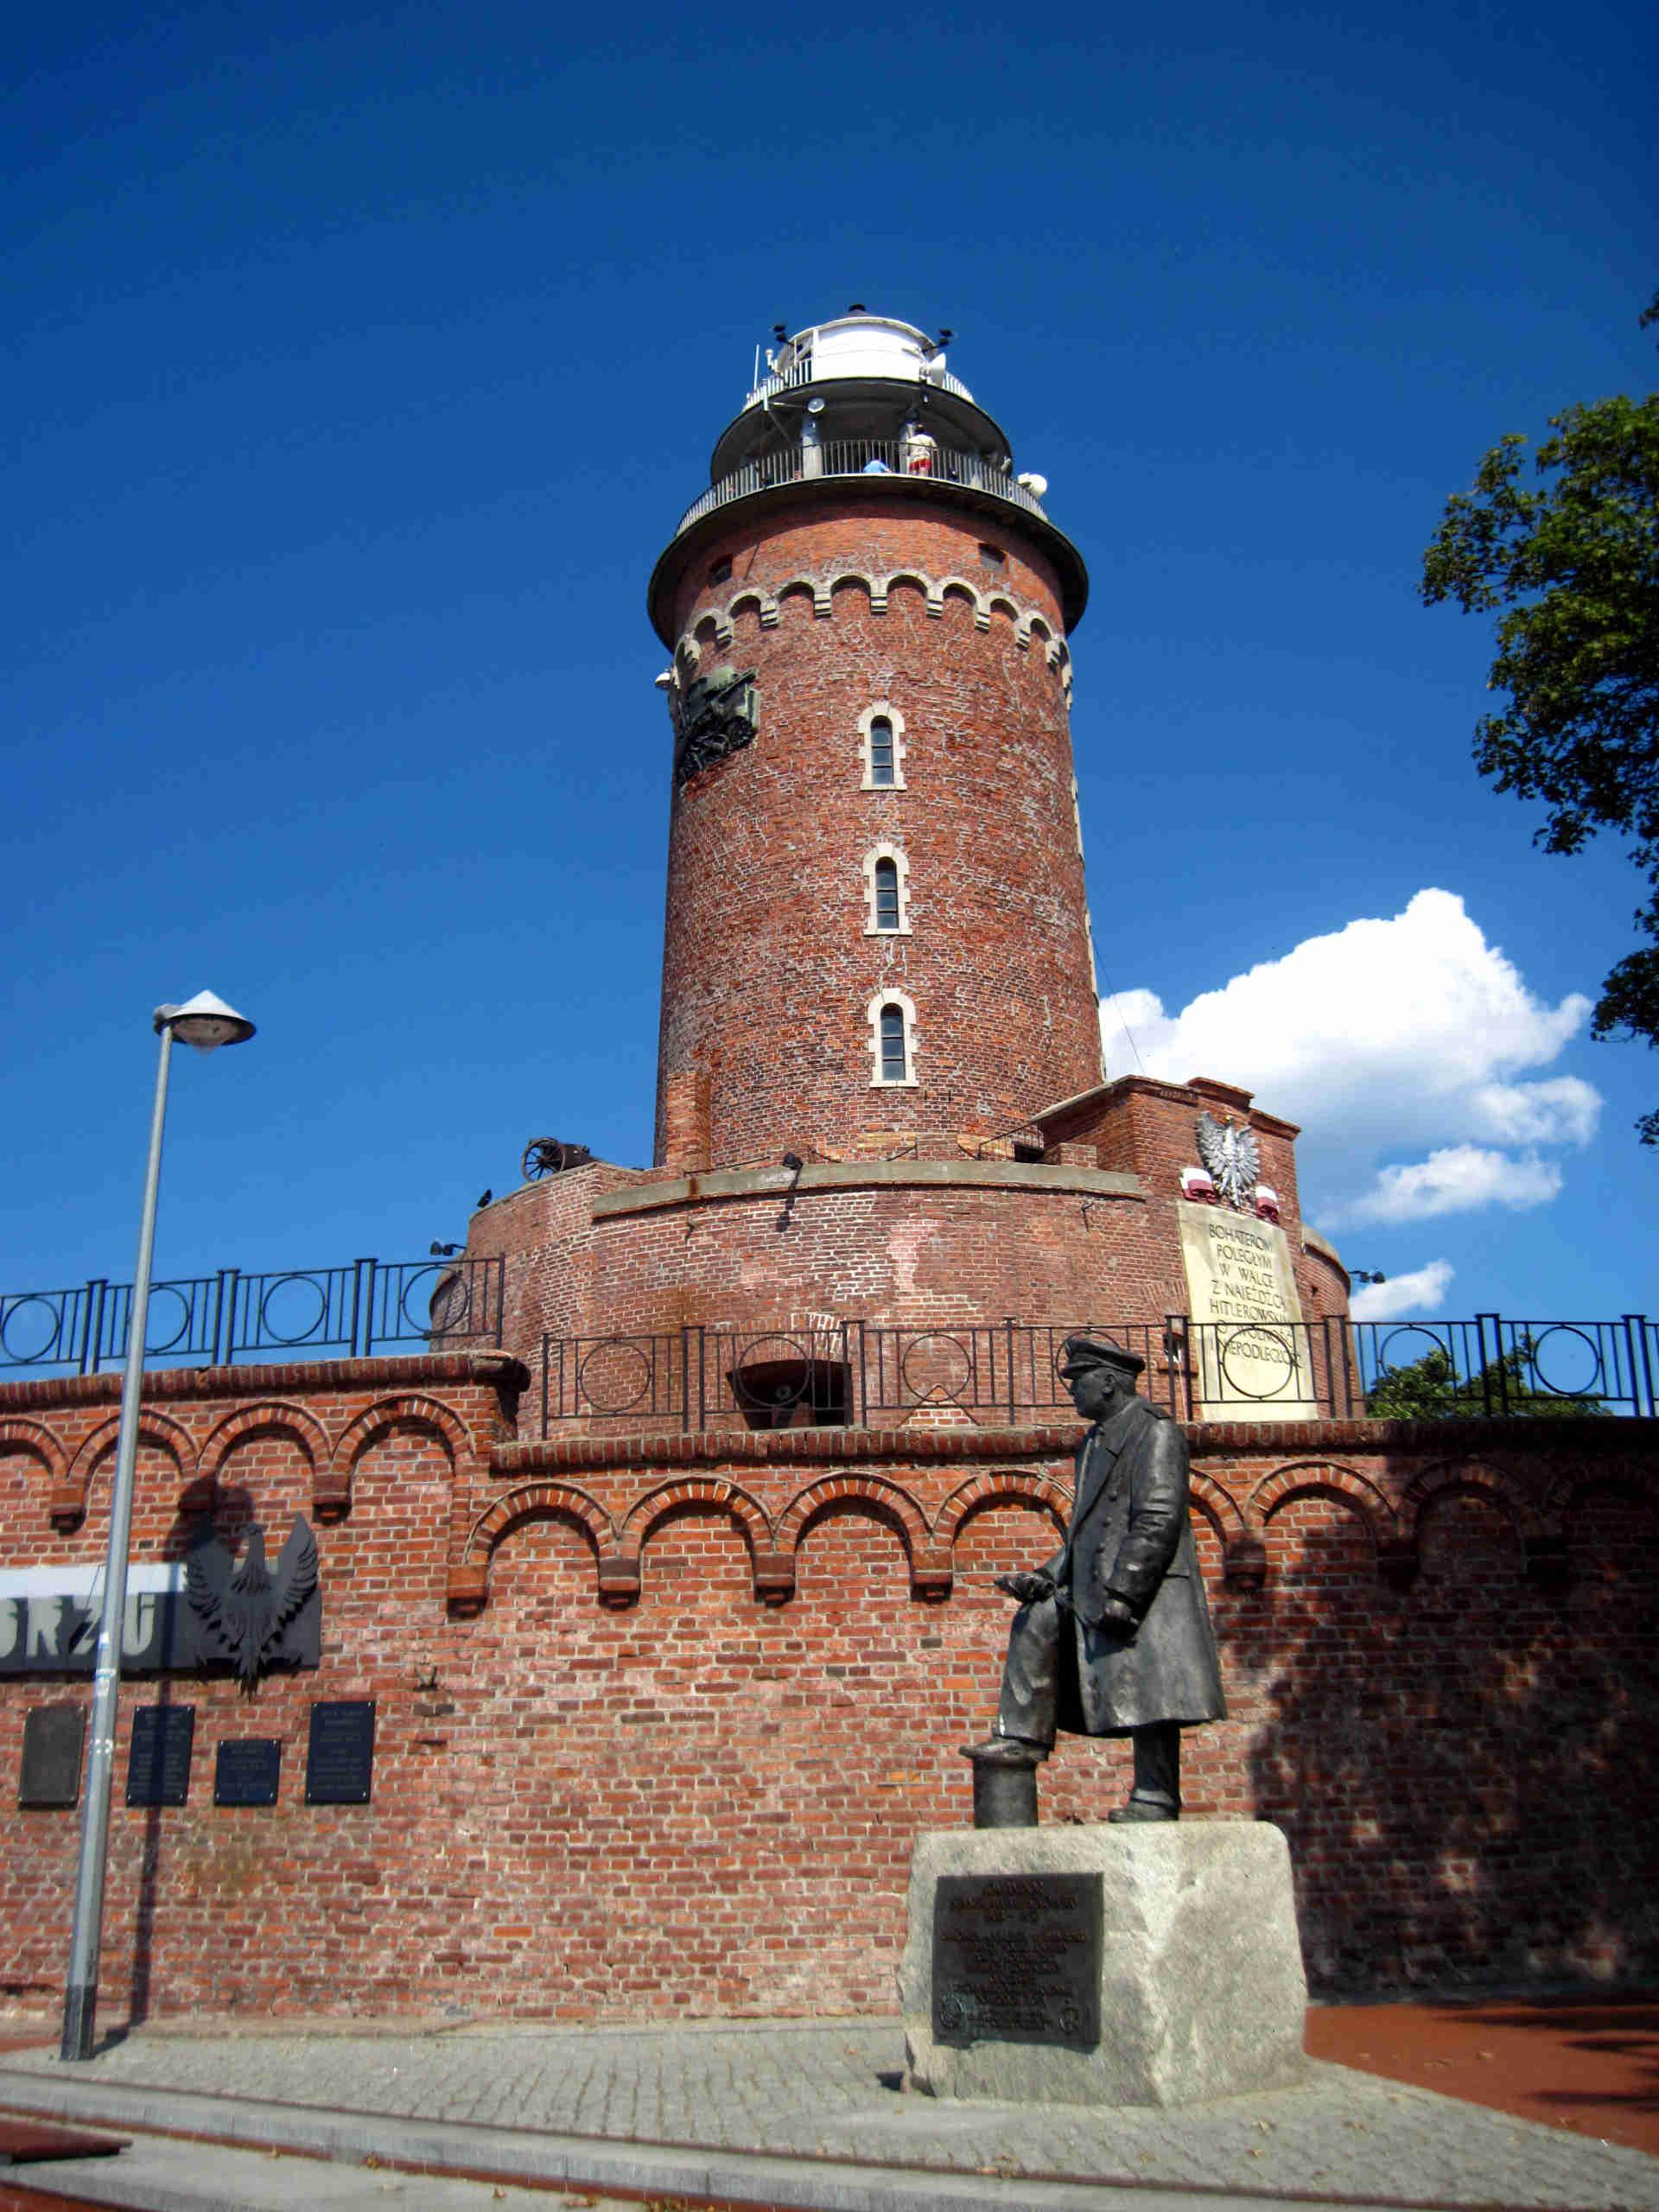 Zu sehen ist Kolbergs Leuchtturm, Bild: Mirand